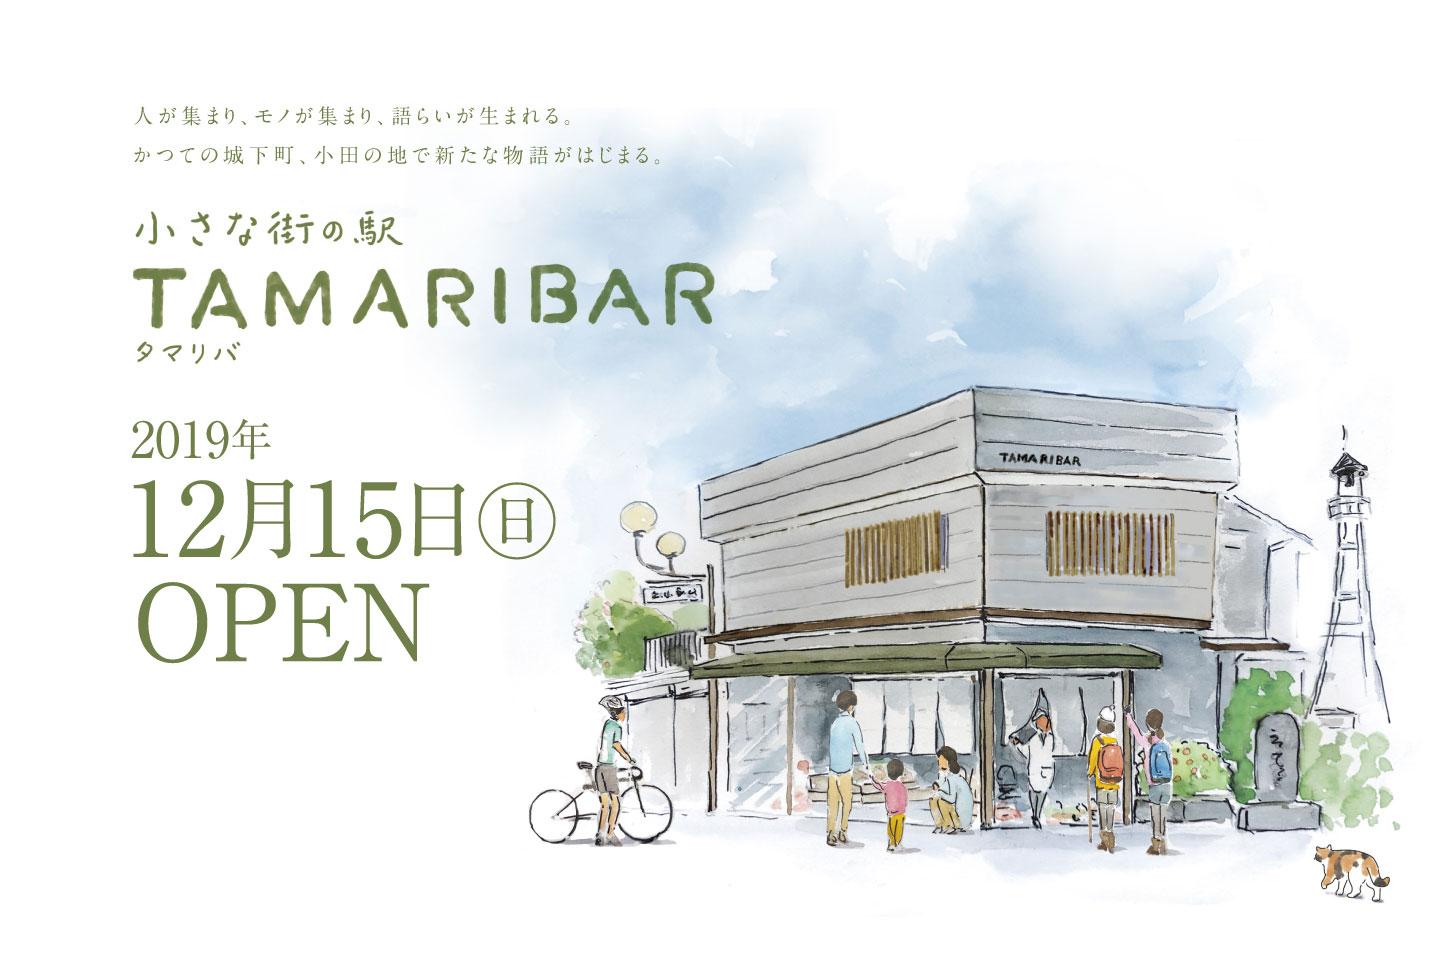 TAMARIBAR(タマリバ)2019.12.15OPEN